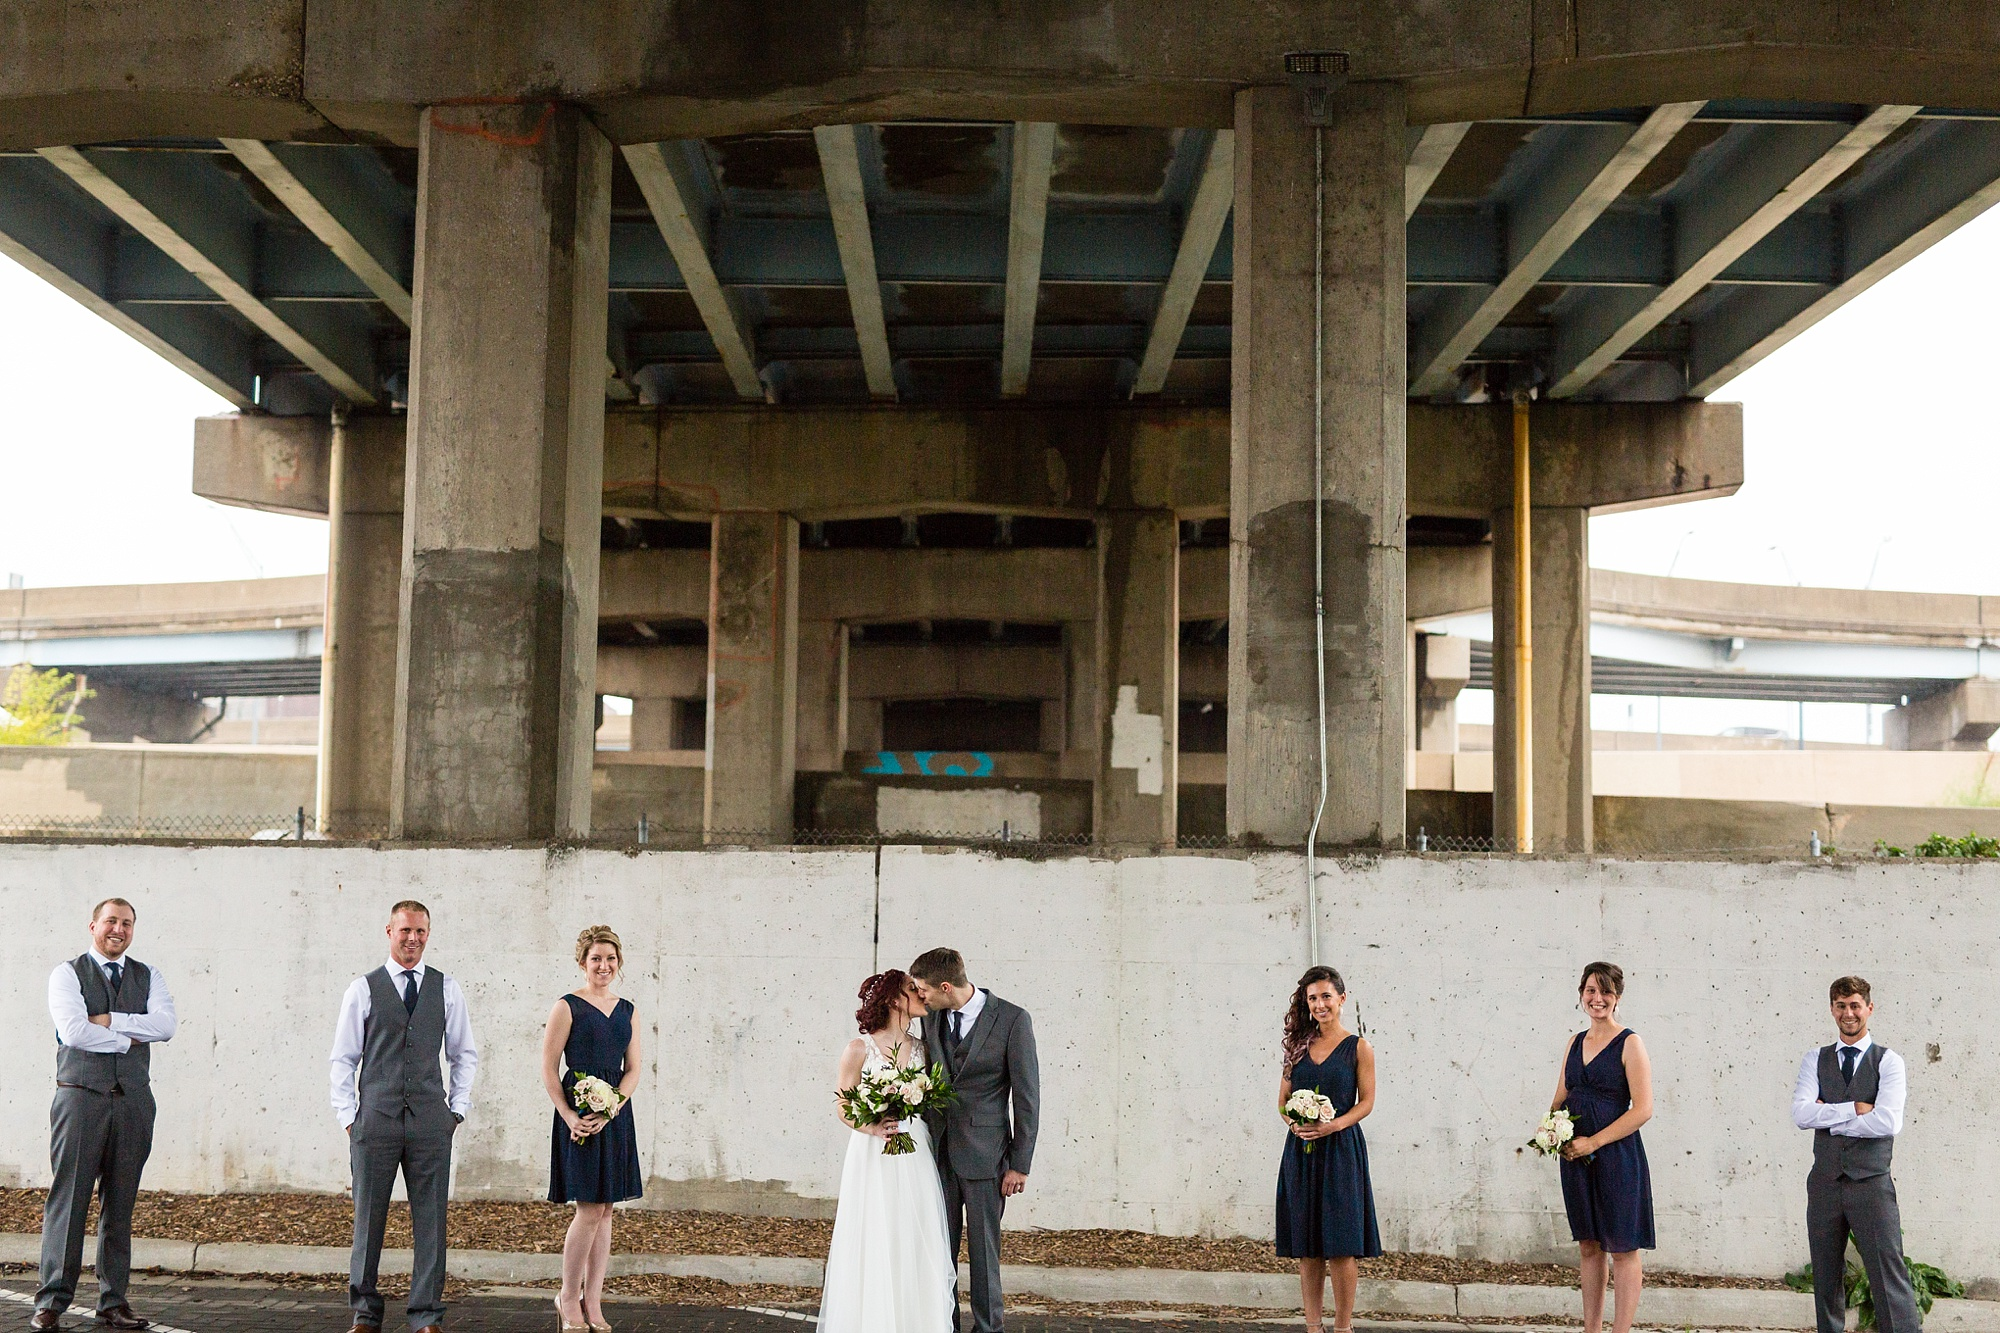 Brandon_Shafer_Photography_Lauren_Ethan_New_Vintage_Place_Grand_Rapids_Wedding_0028.jpg